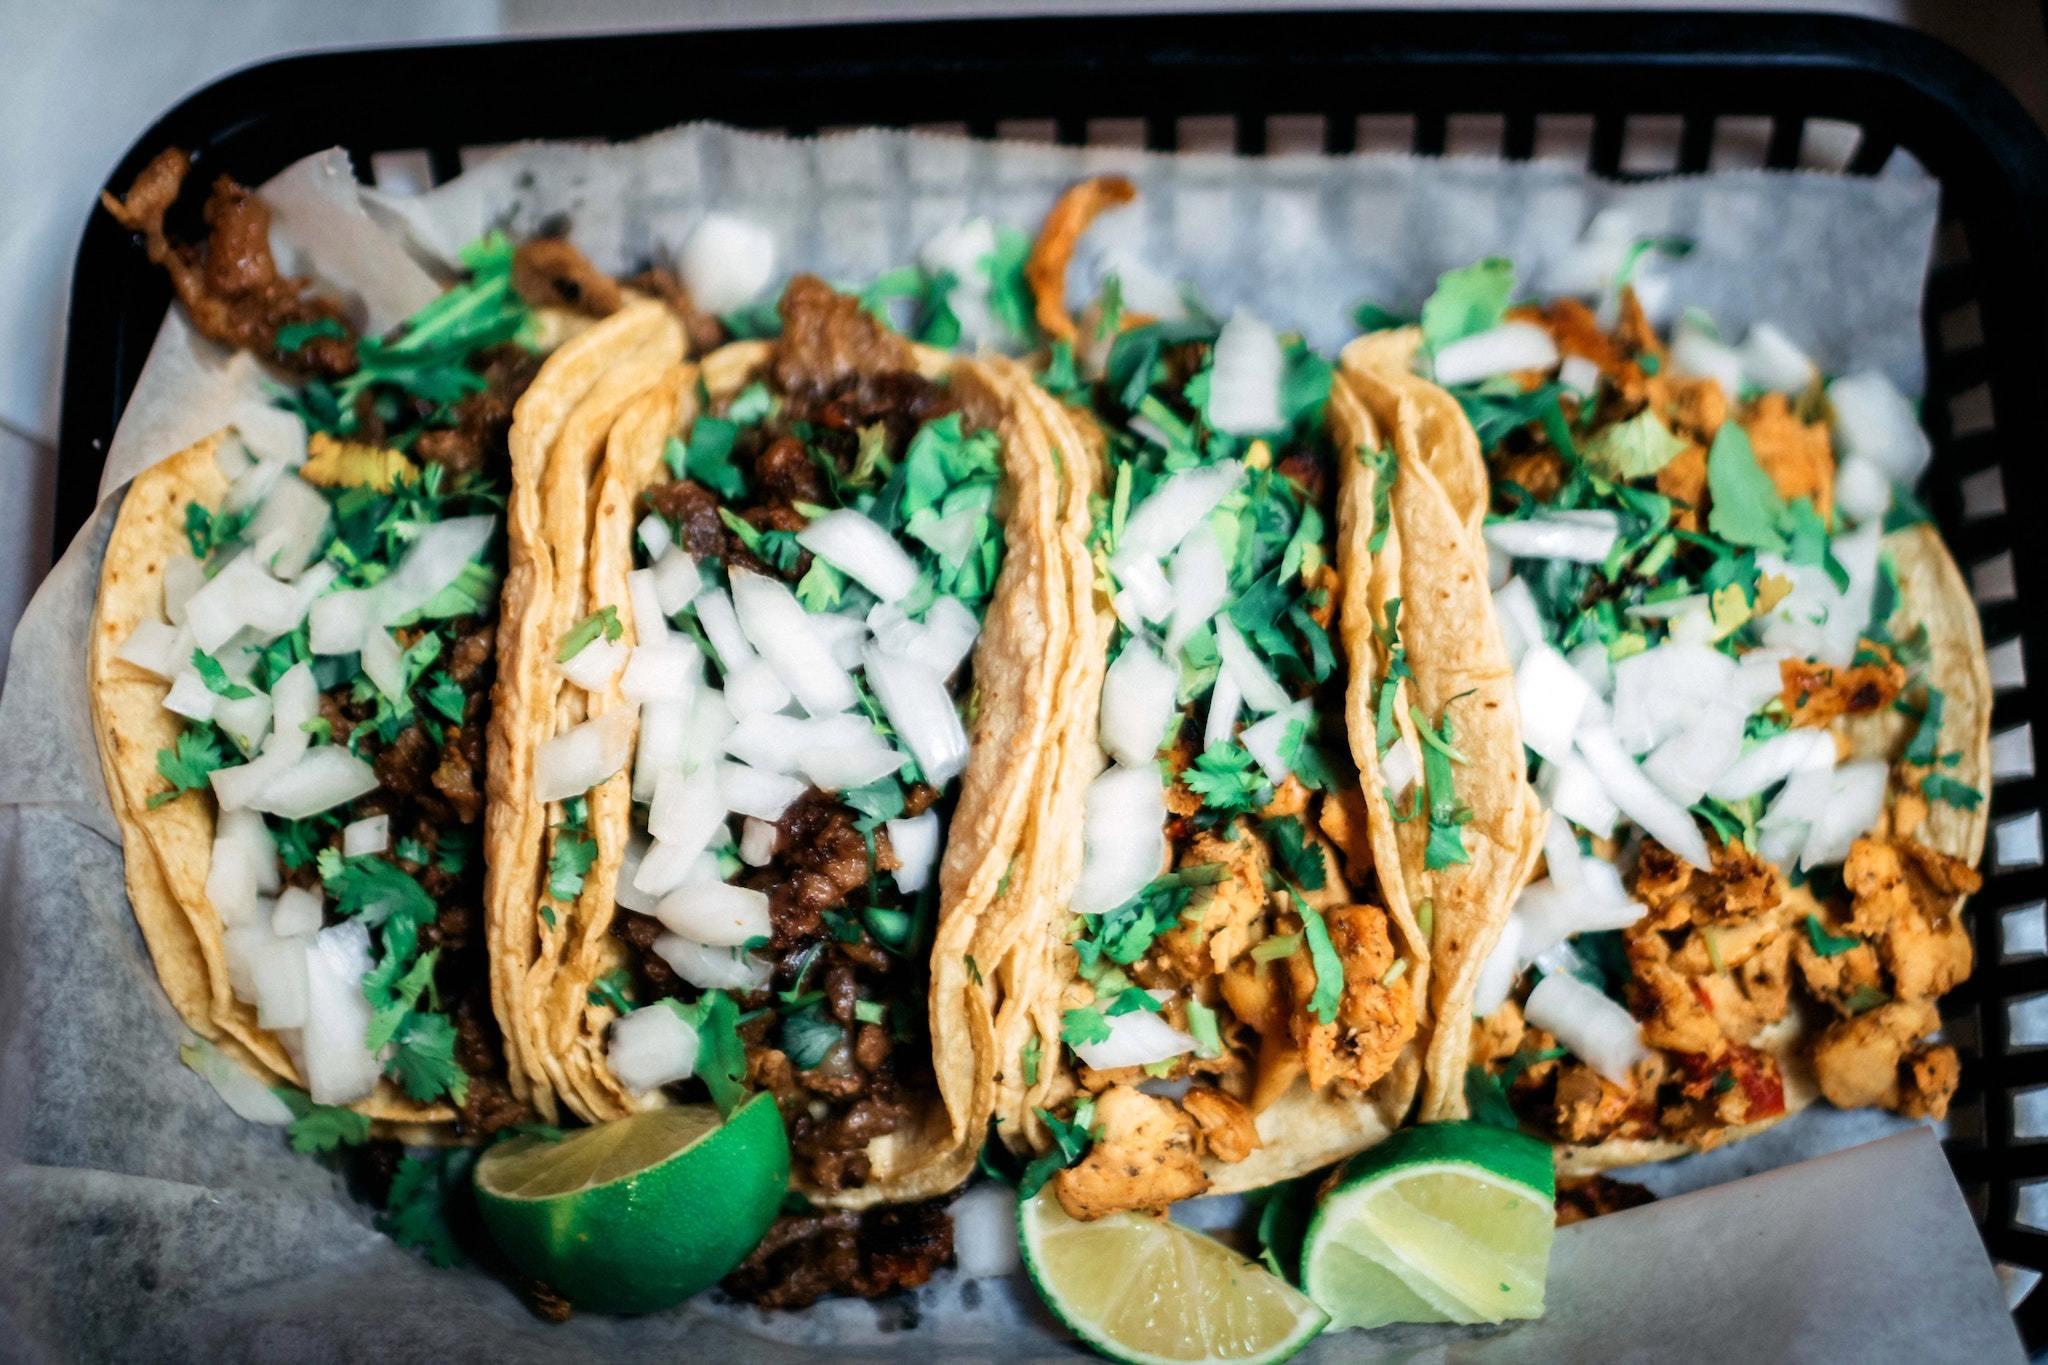 Tacos stock